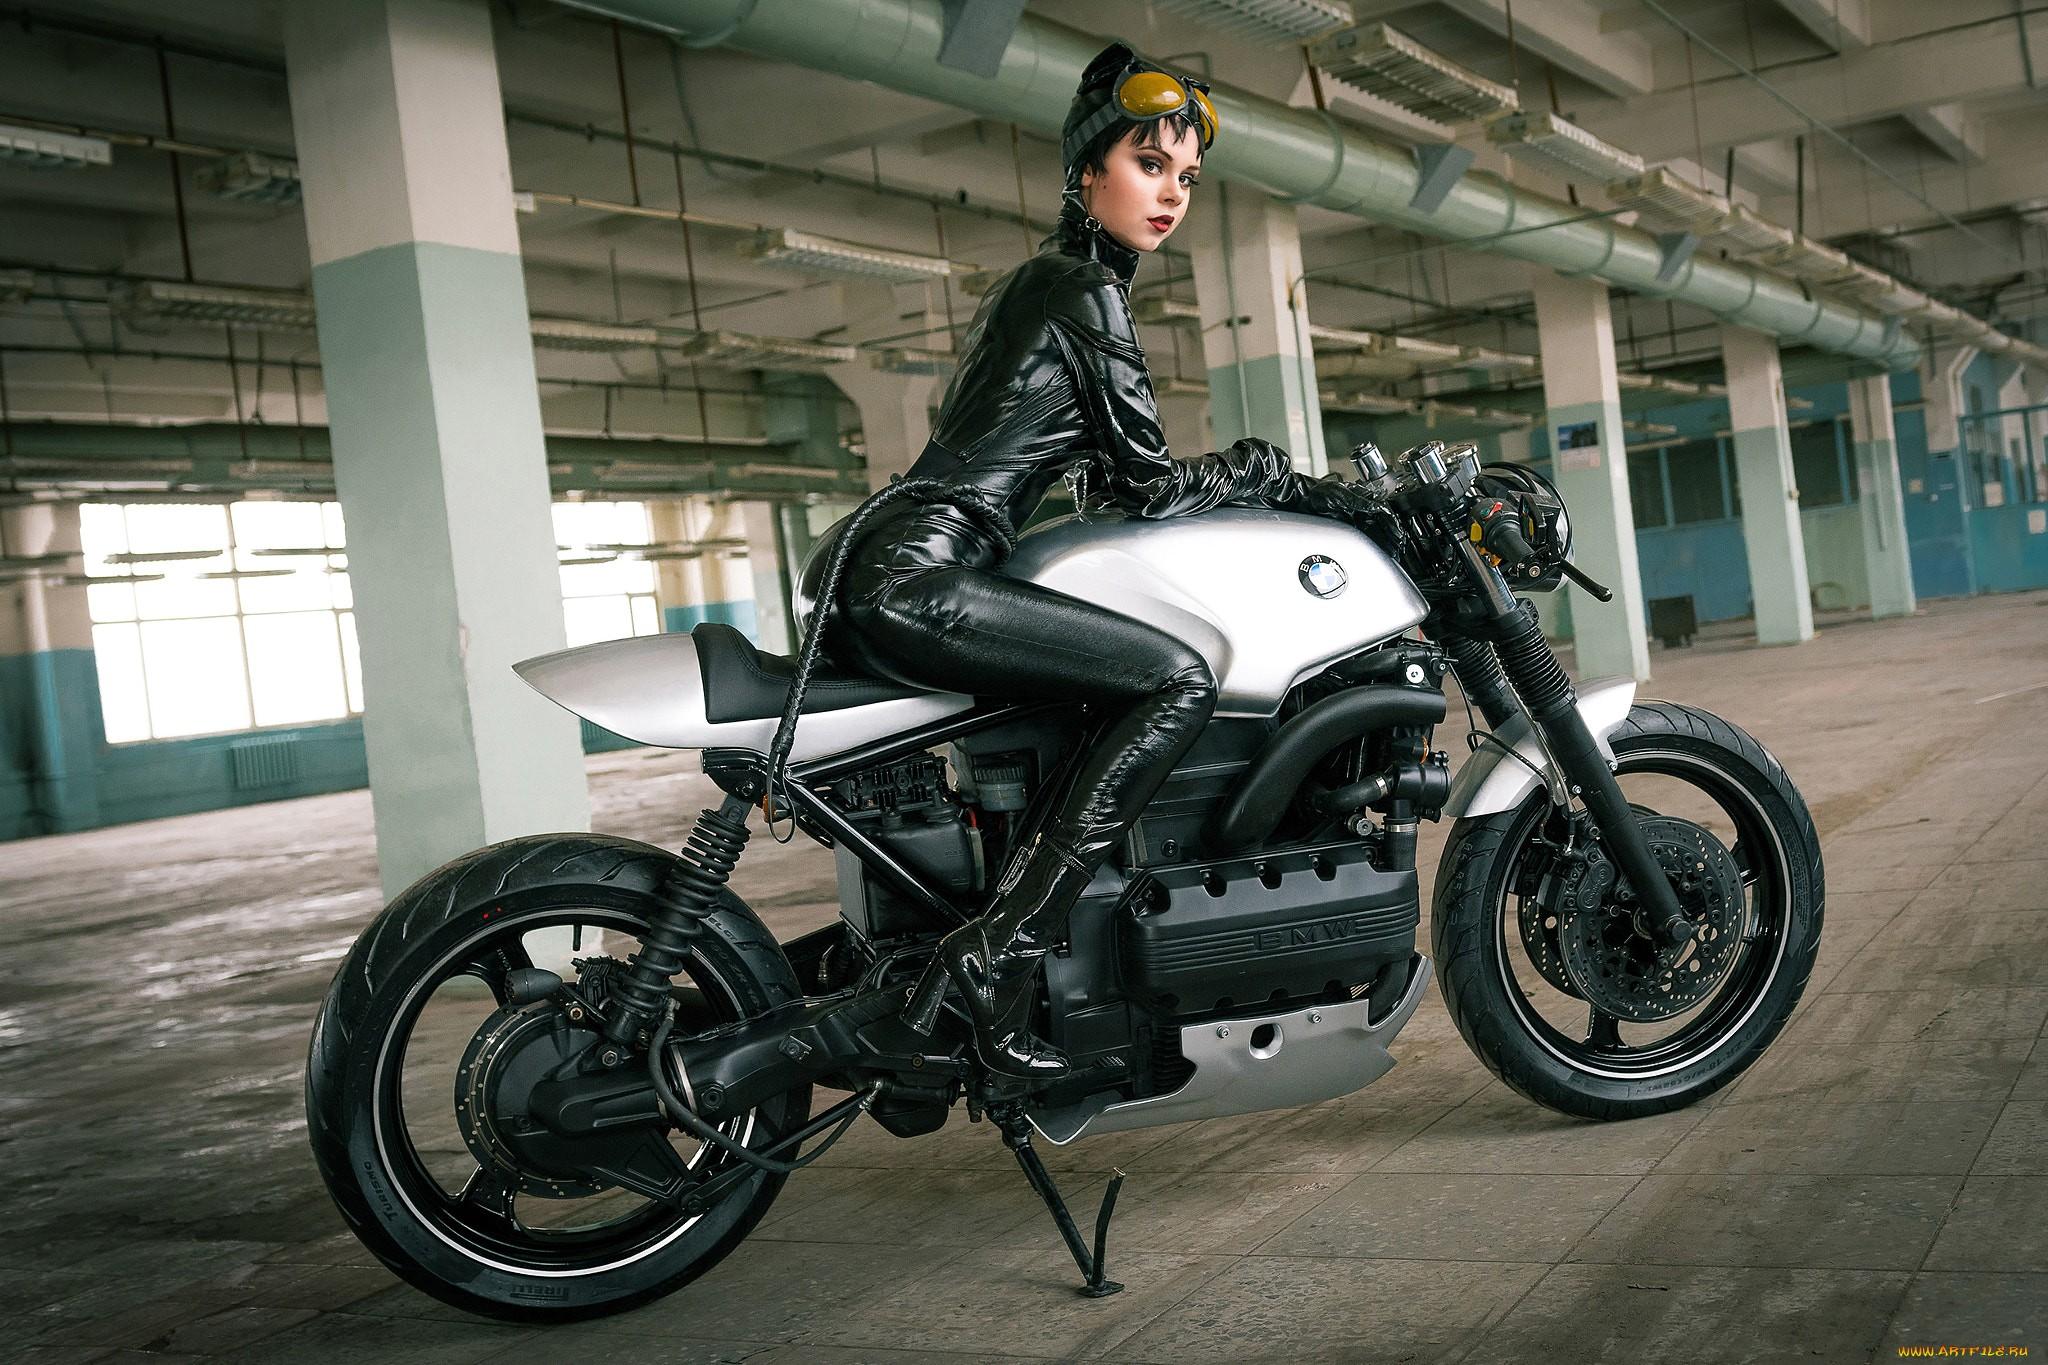 People 2048x1365 women with bikes motorcycle leather latex women BMW Catwoman cosplay bodysuit Pirelli